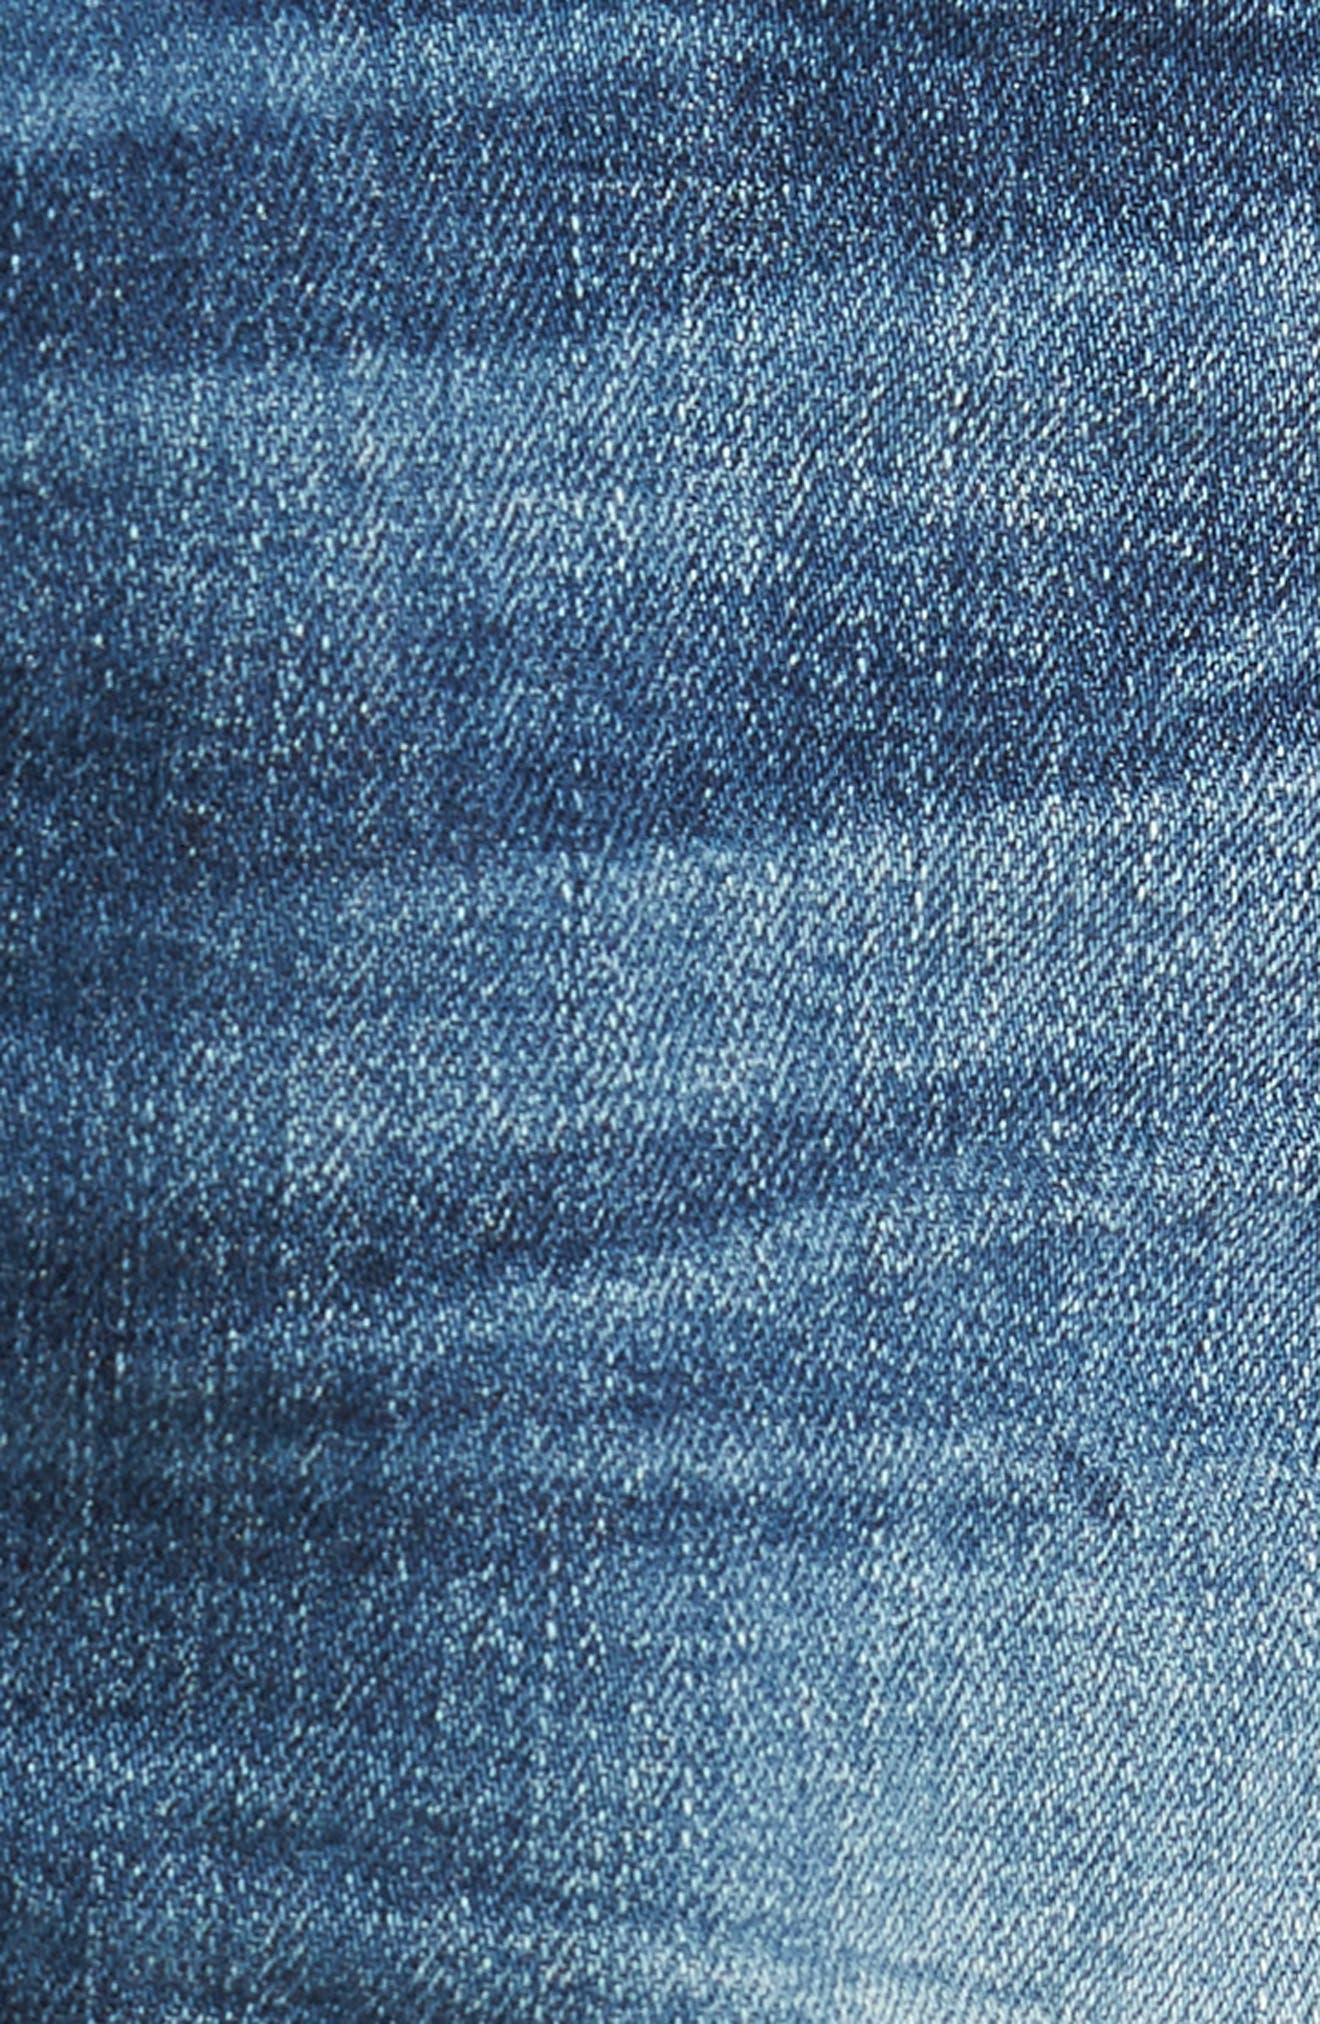 Corey Distressed Slouchy Denim Shorts,                             Alternate thumbnail 6, color,                             423